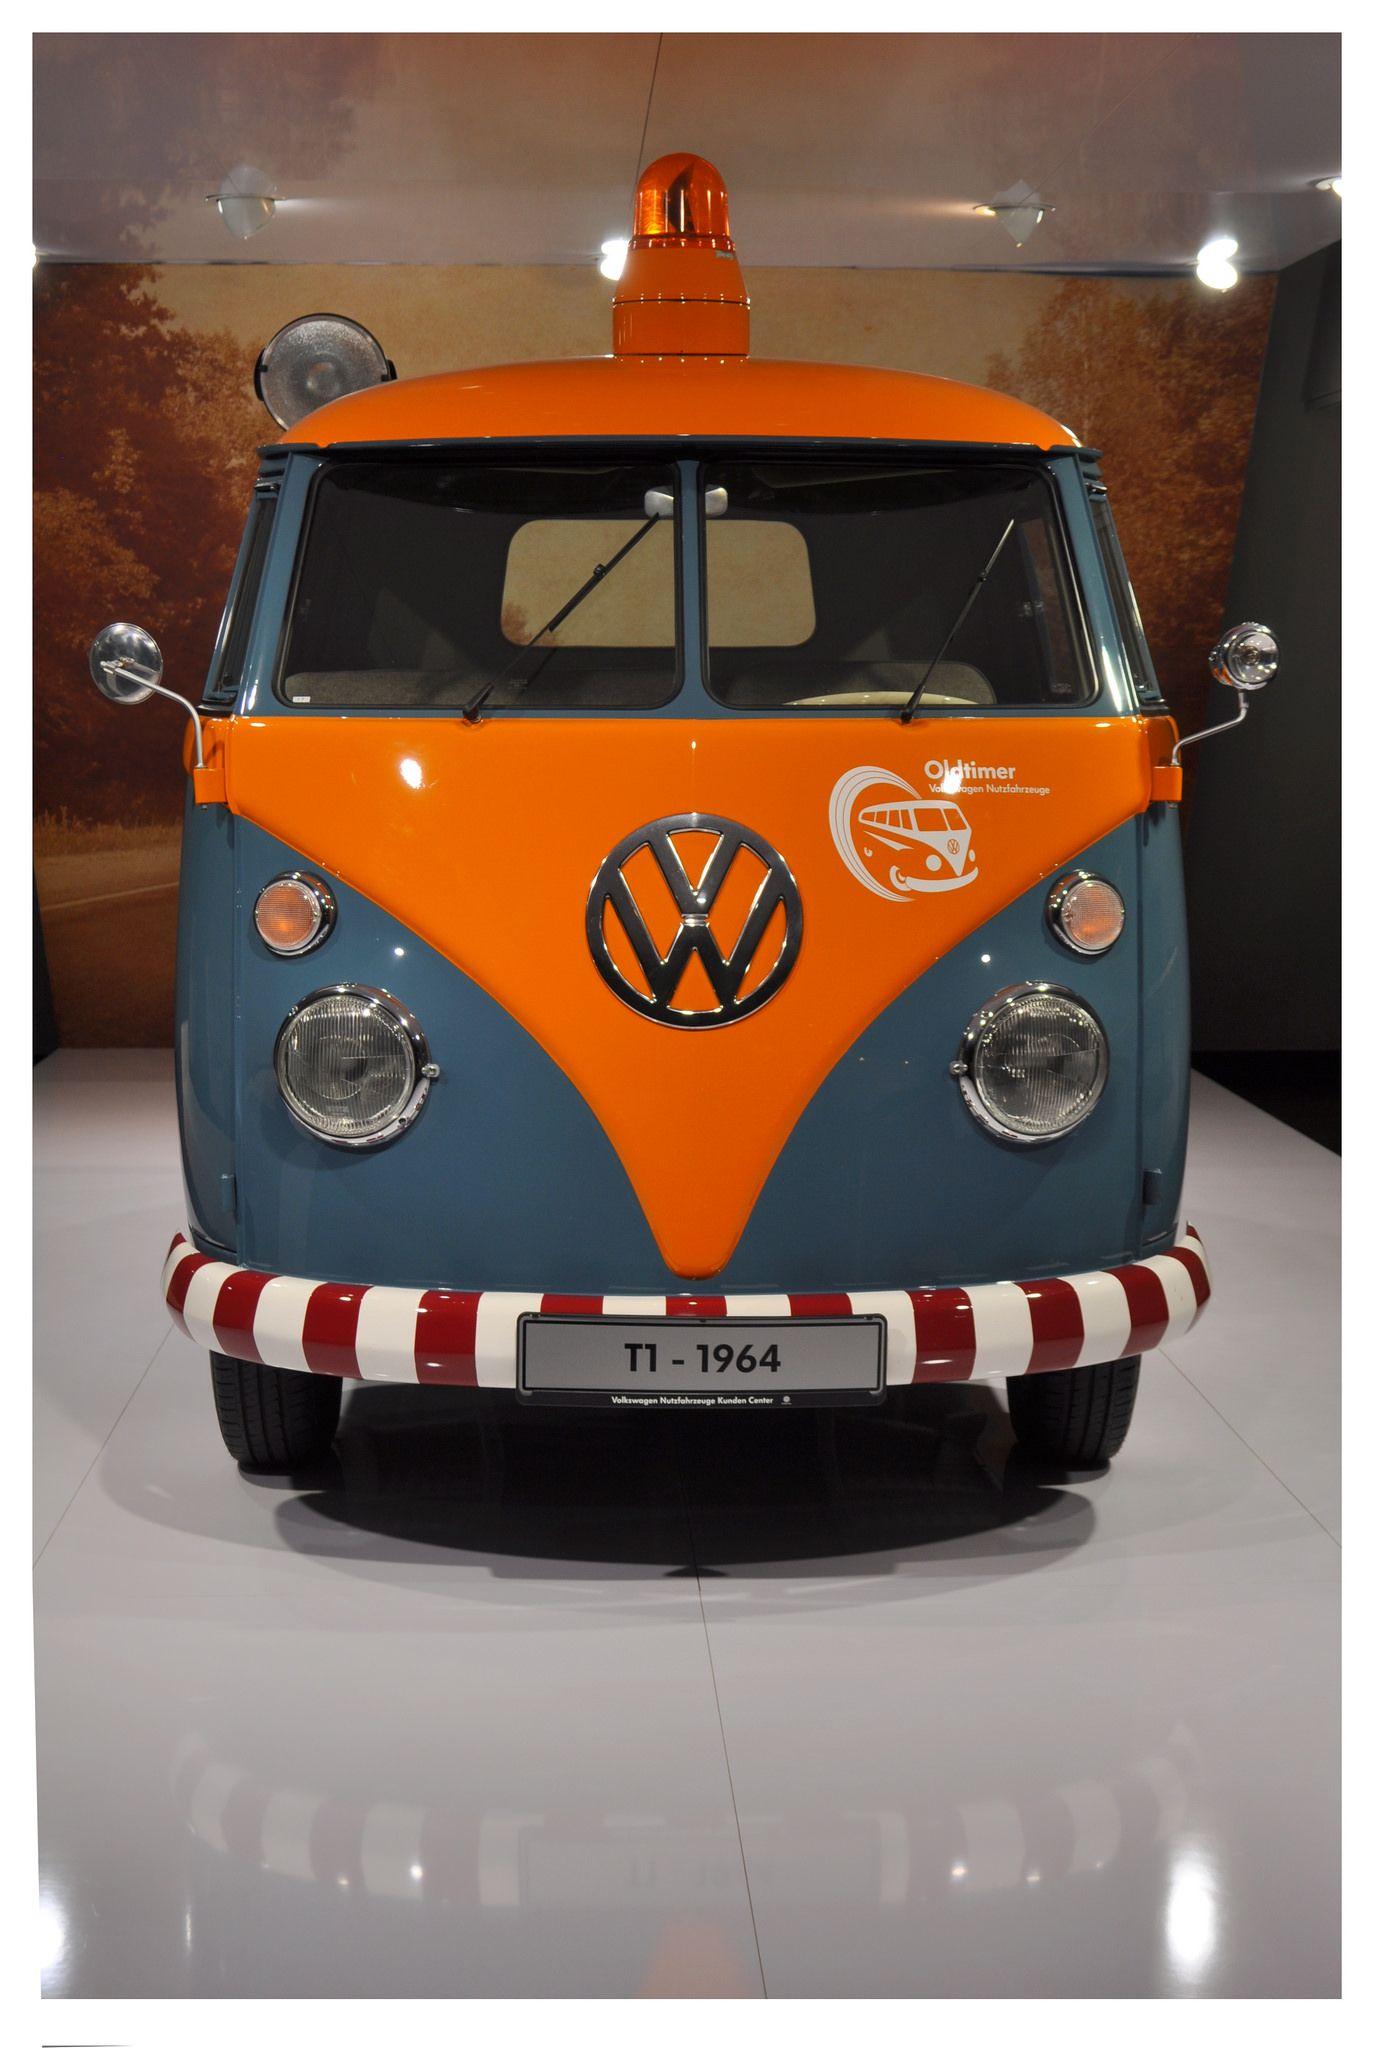 Volkswagen T1 Customer Service Support Vehicle 1964 Volkswagen Vehicles Volkswagen Bus